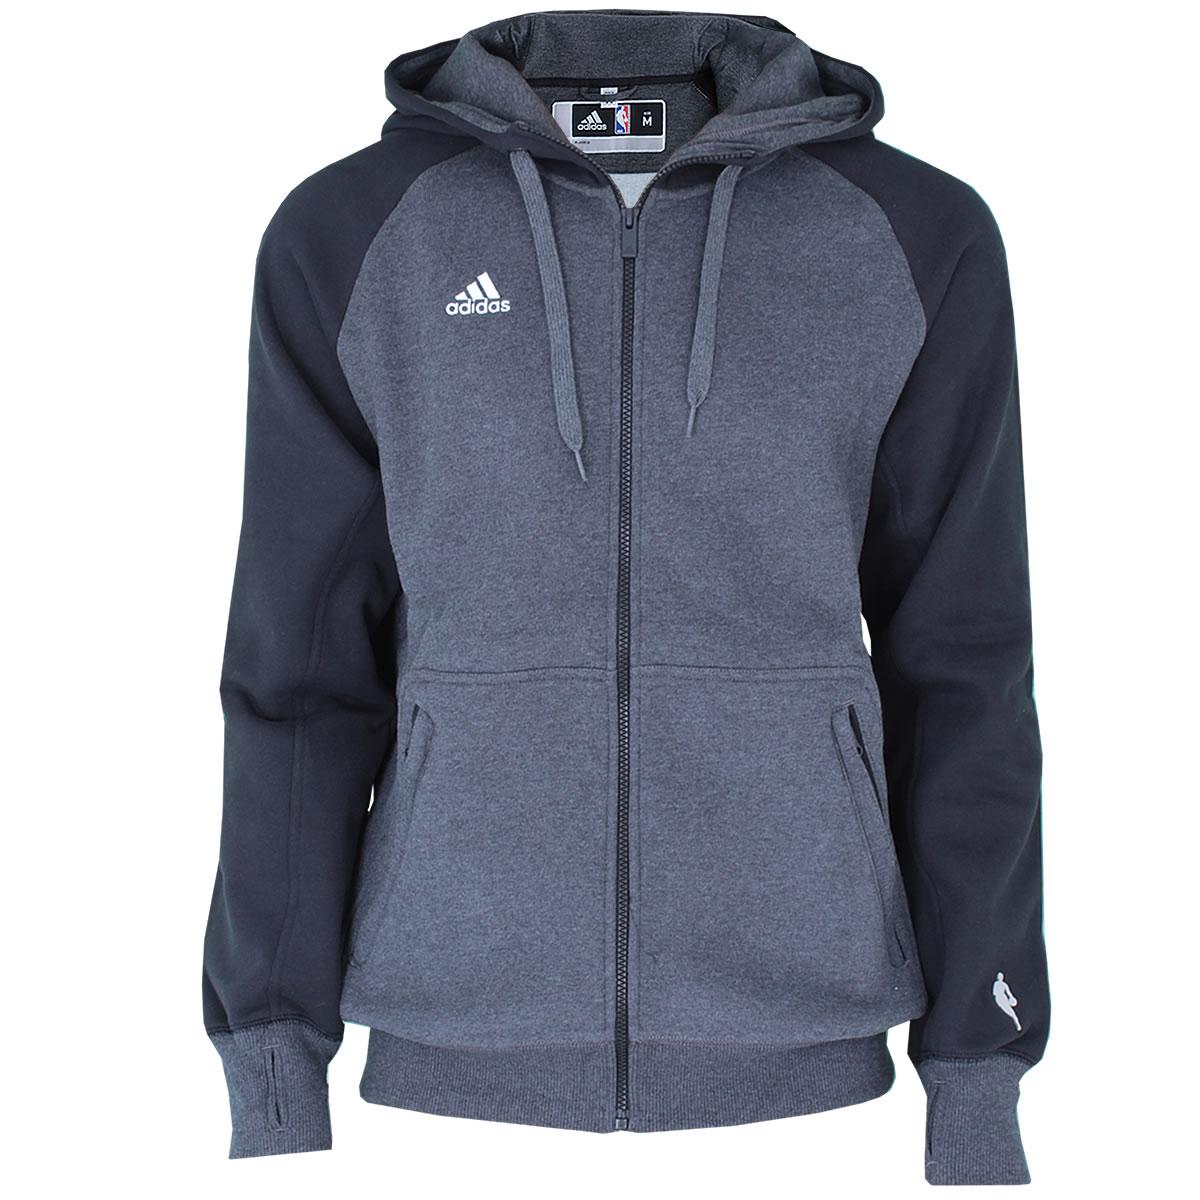 adidas Herren Jacke NBA Sweatjacke Kapuzenjacke PSTGM FZ